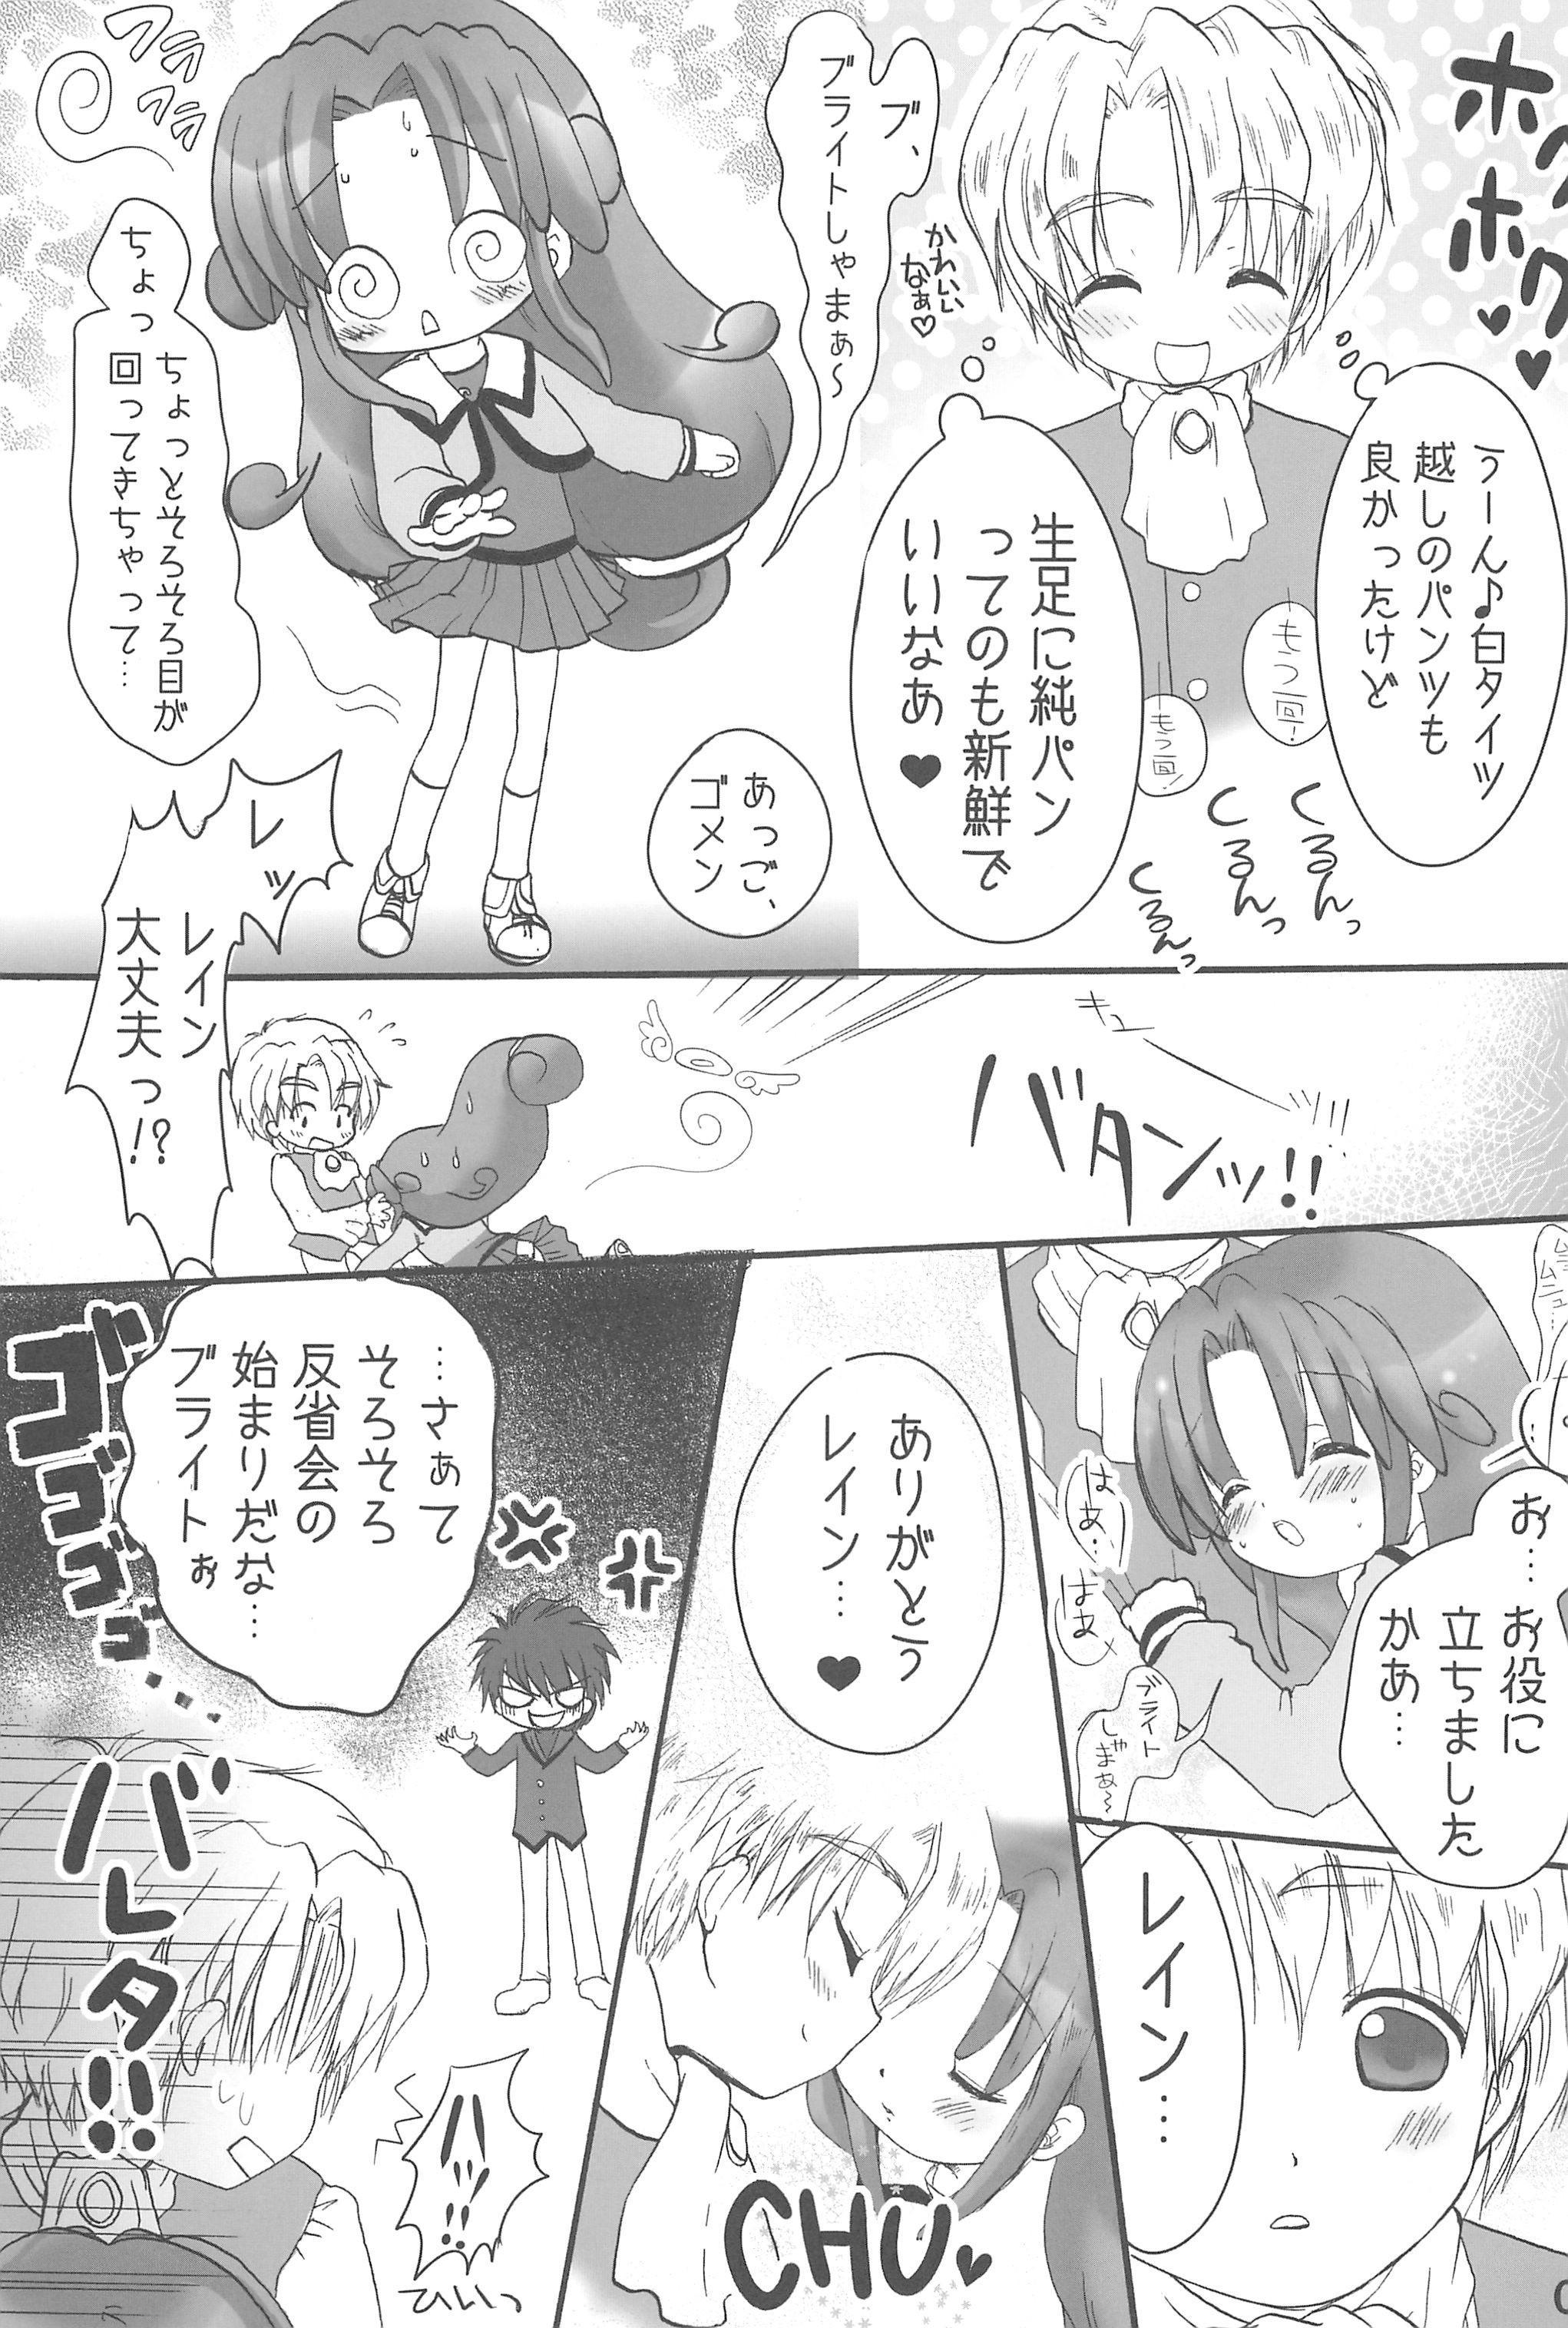 Rein-sama, Goyoujin! 6